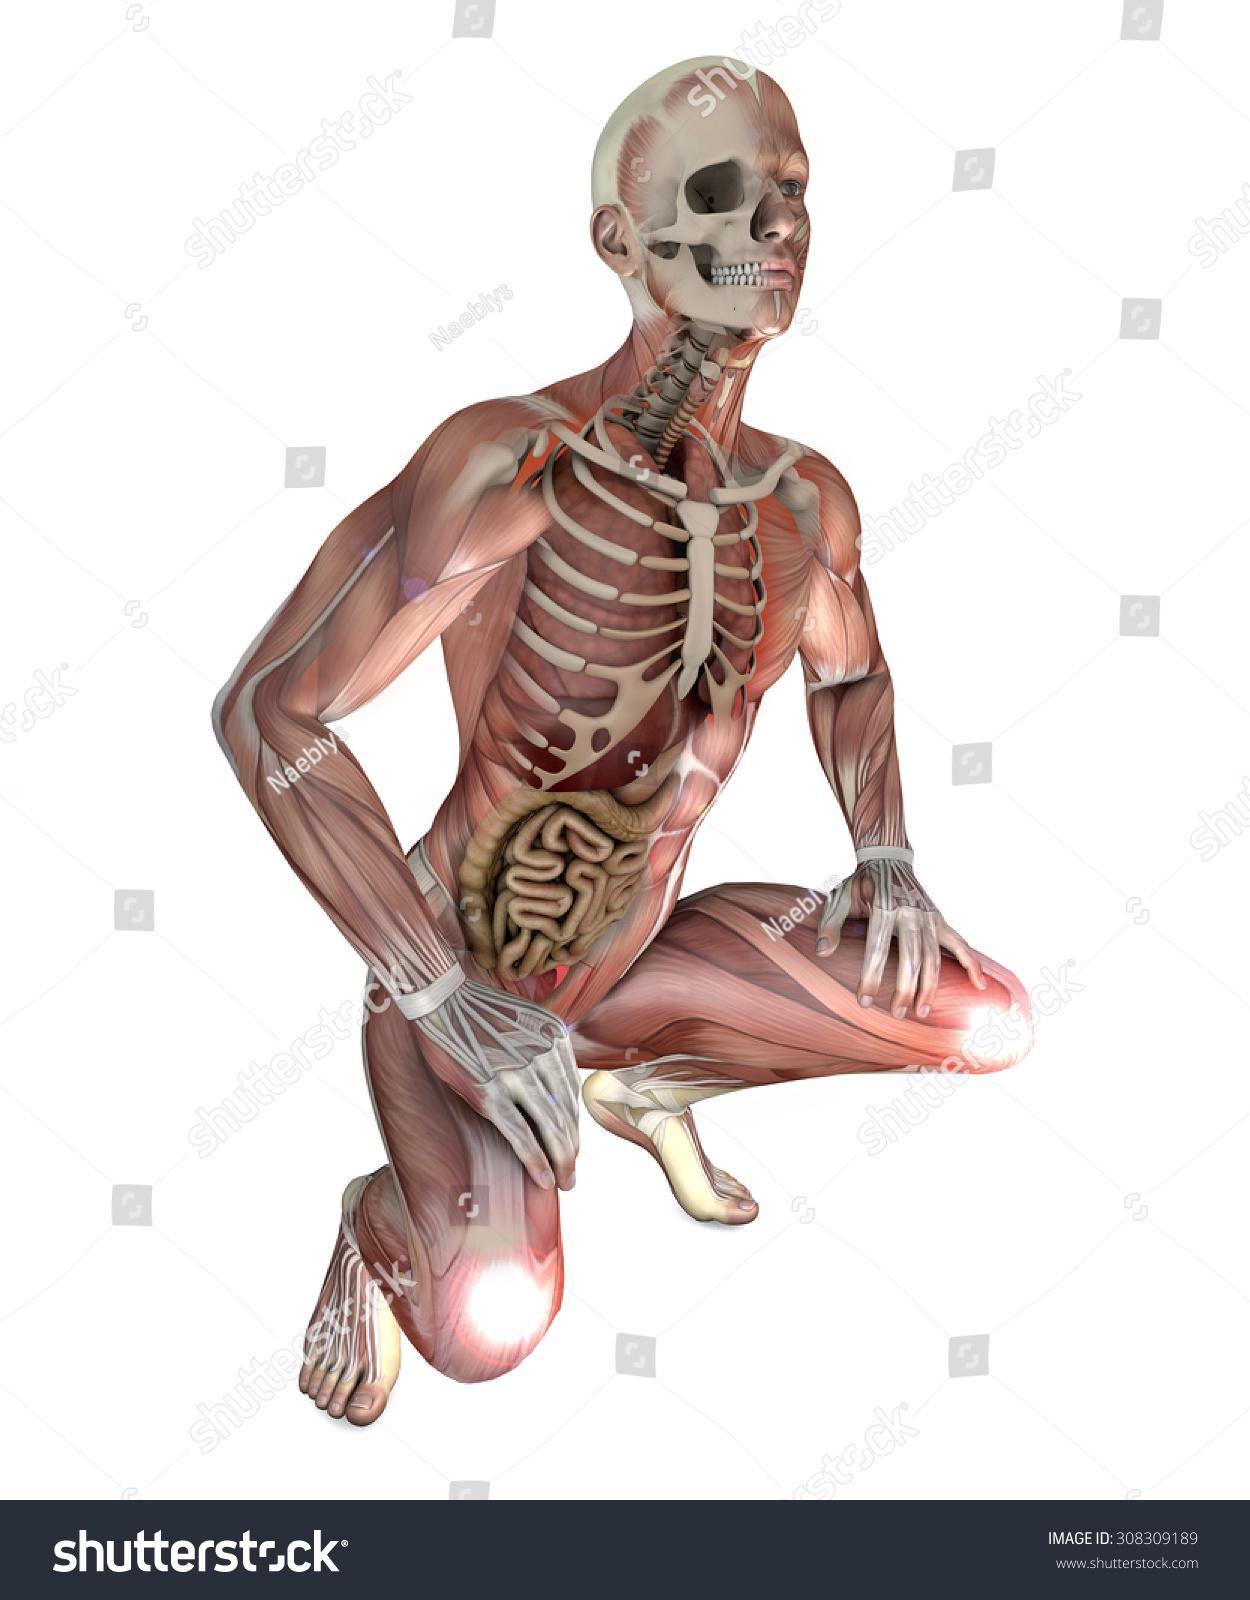 Male Body Skeletal Muscles Organs Stock Illustration 308309189